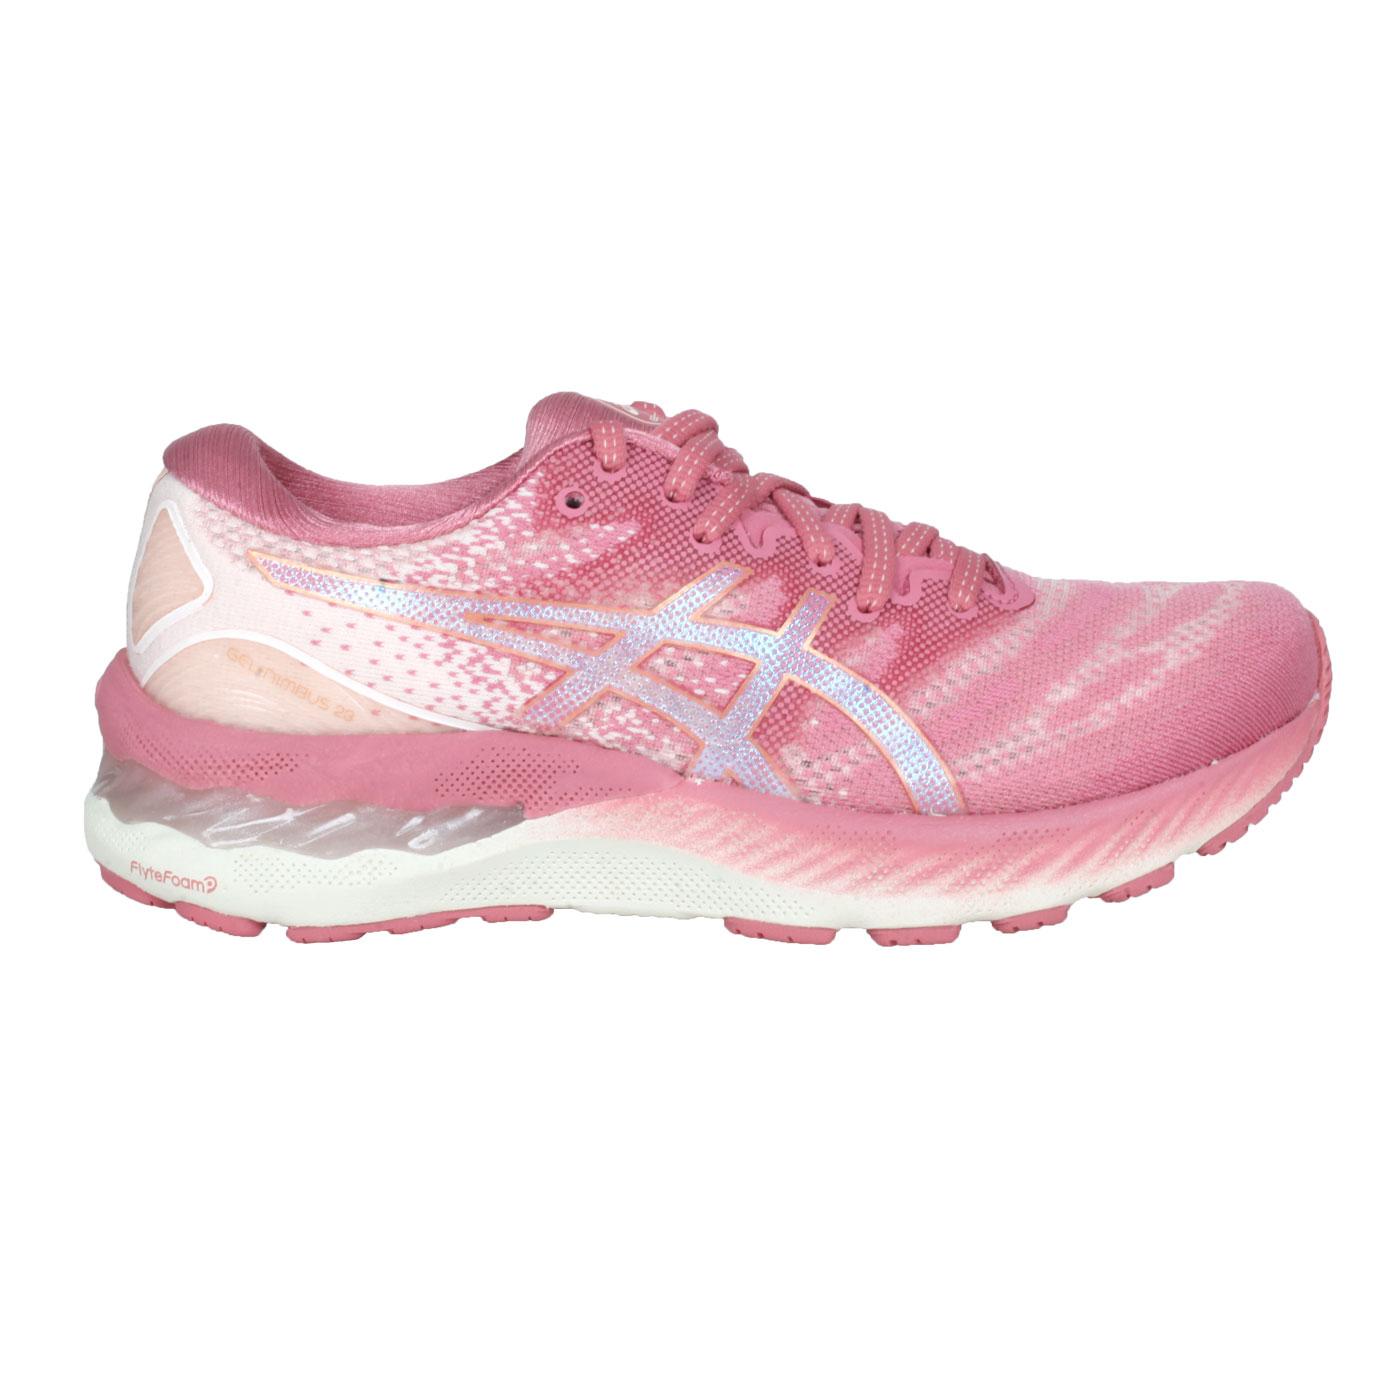 ASICS 女款慢跑鞋  @GEL-NIMBUS 23@1012A885-708 - 玫紅粉橘